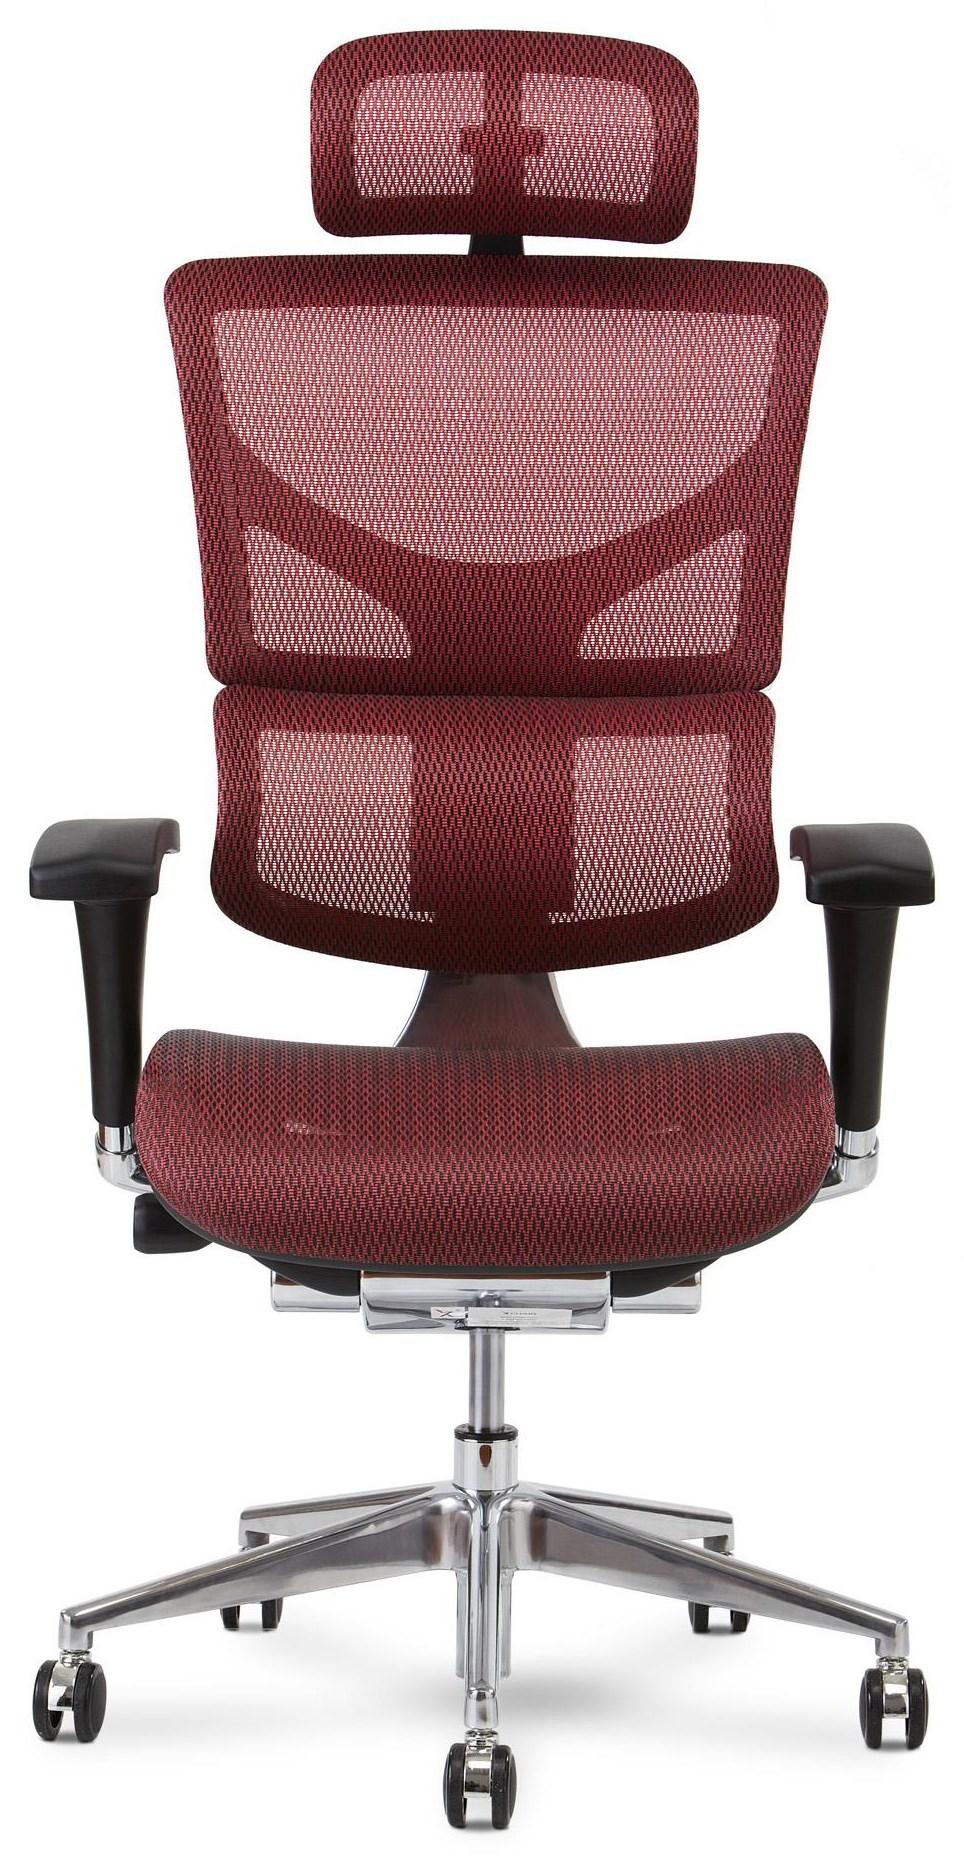 X2 Executive Chair by X-Chair at HomeWorld Furniture